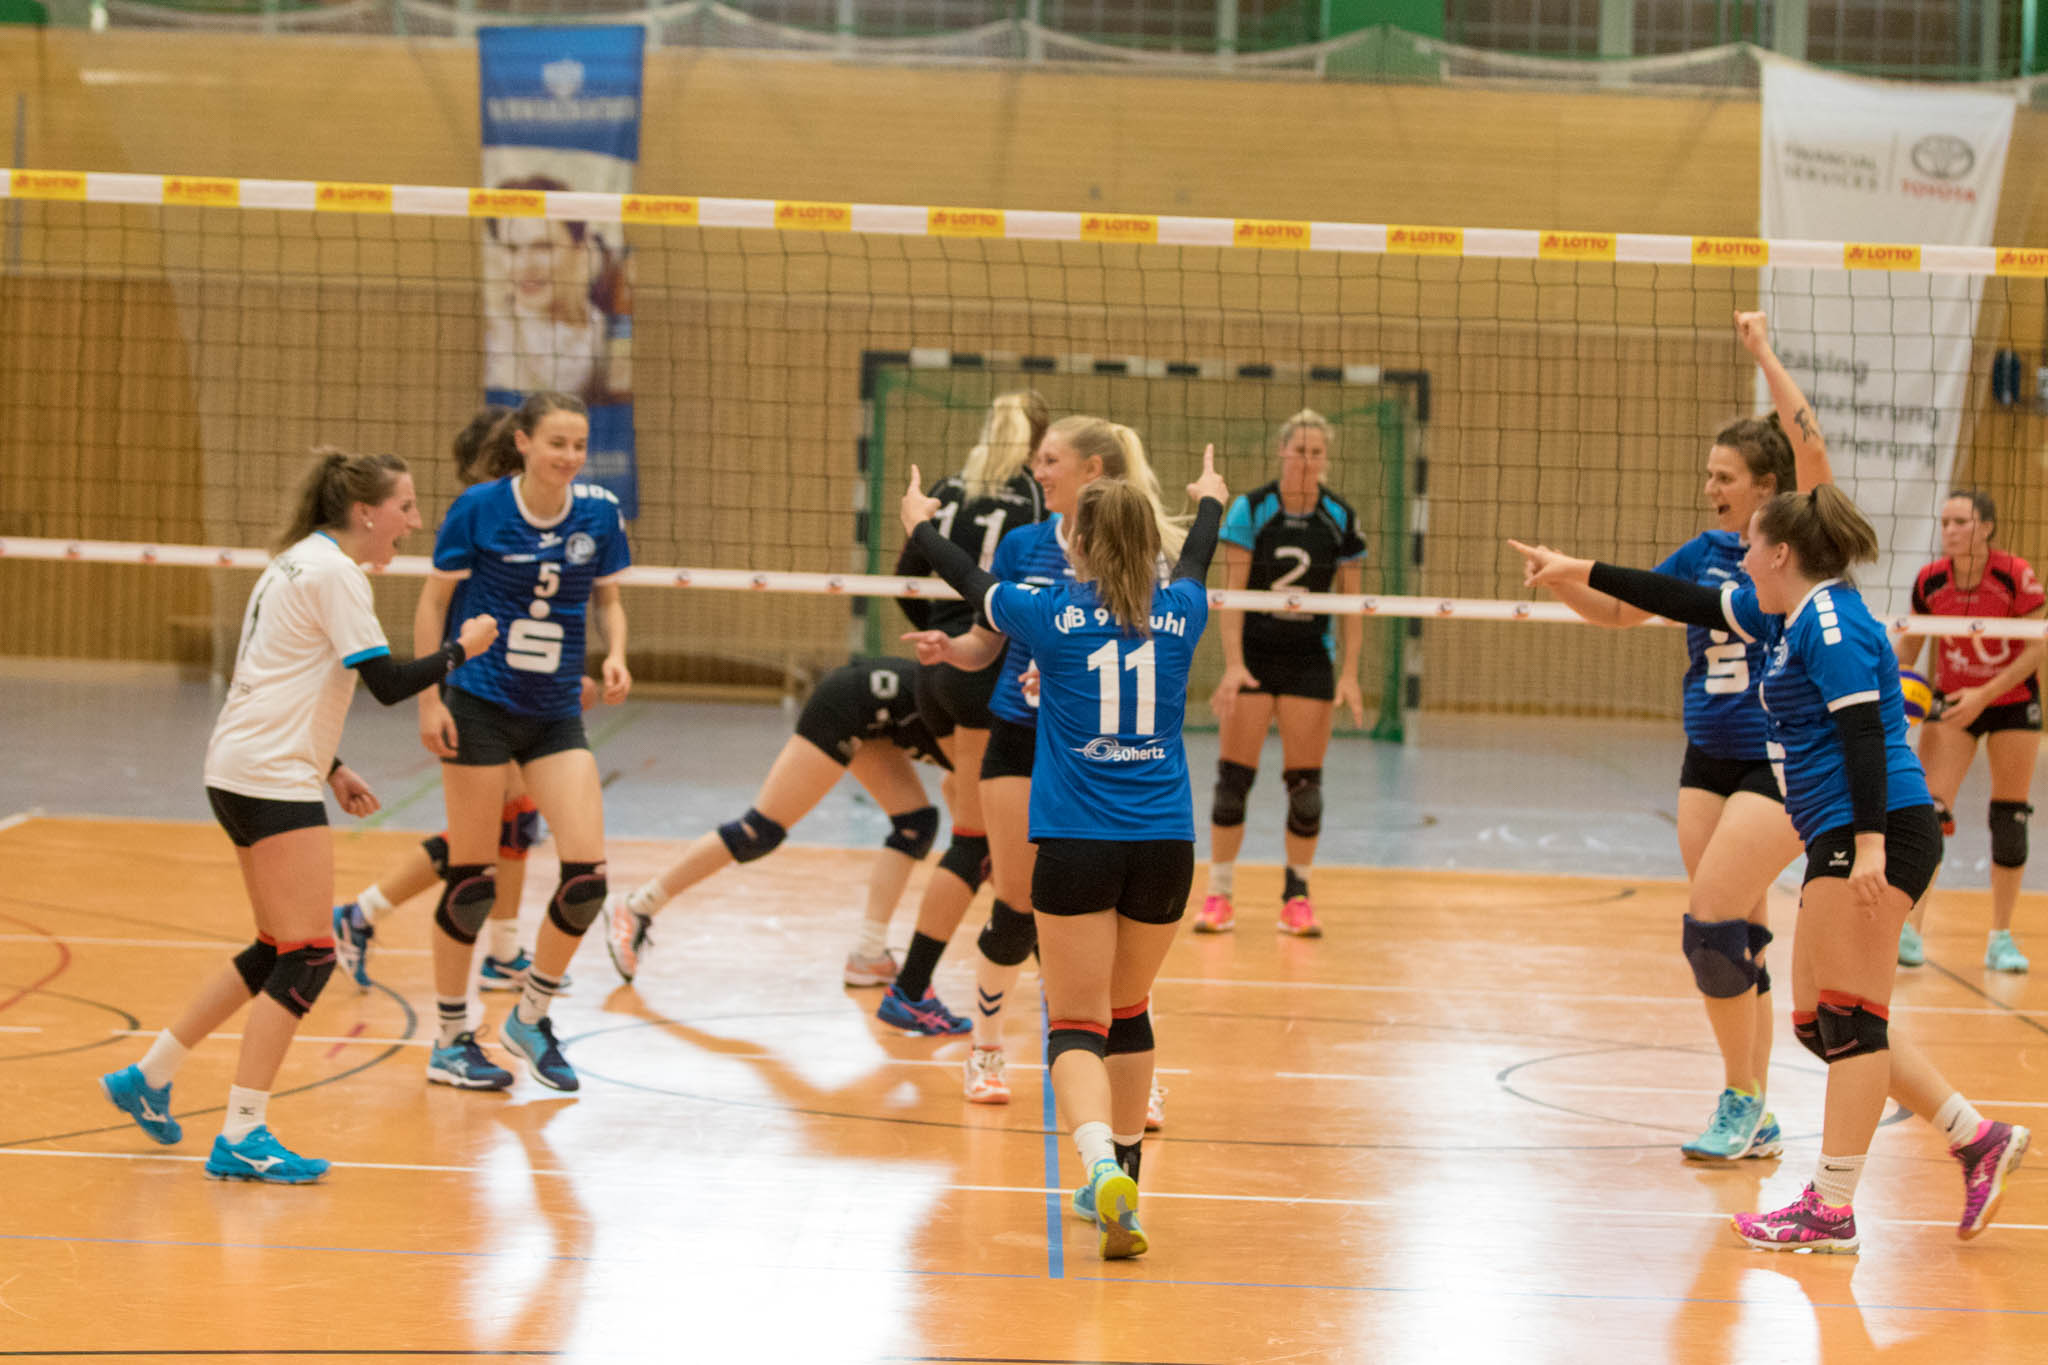 Volleyball-Regionalliga Ost: VfB 91 Suhl 2 : SG Erfurt electronic . 13.10.2018 (Foto: Stephan Roßteuscher)